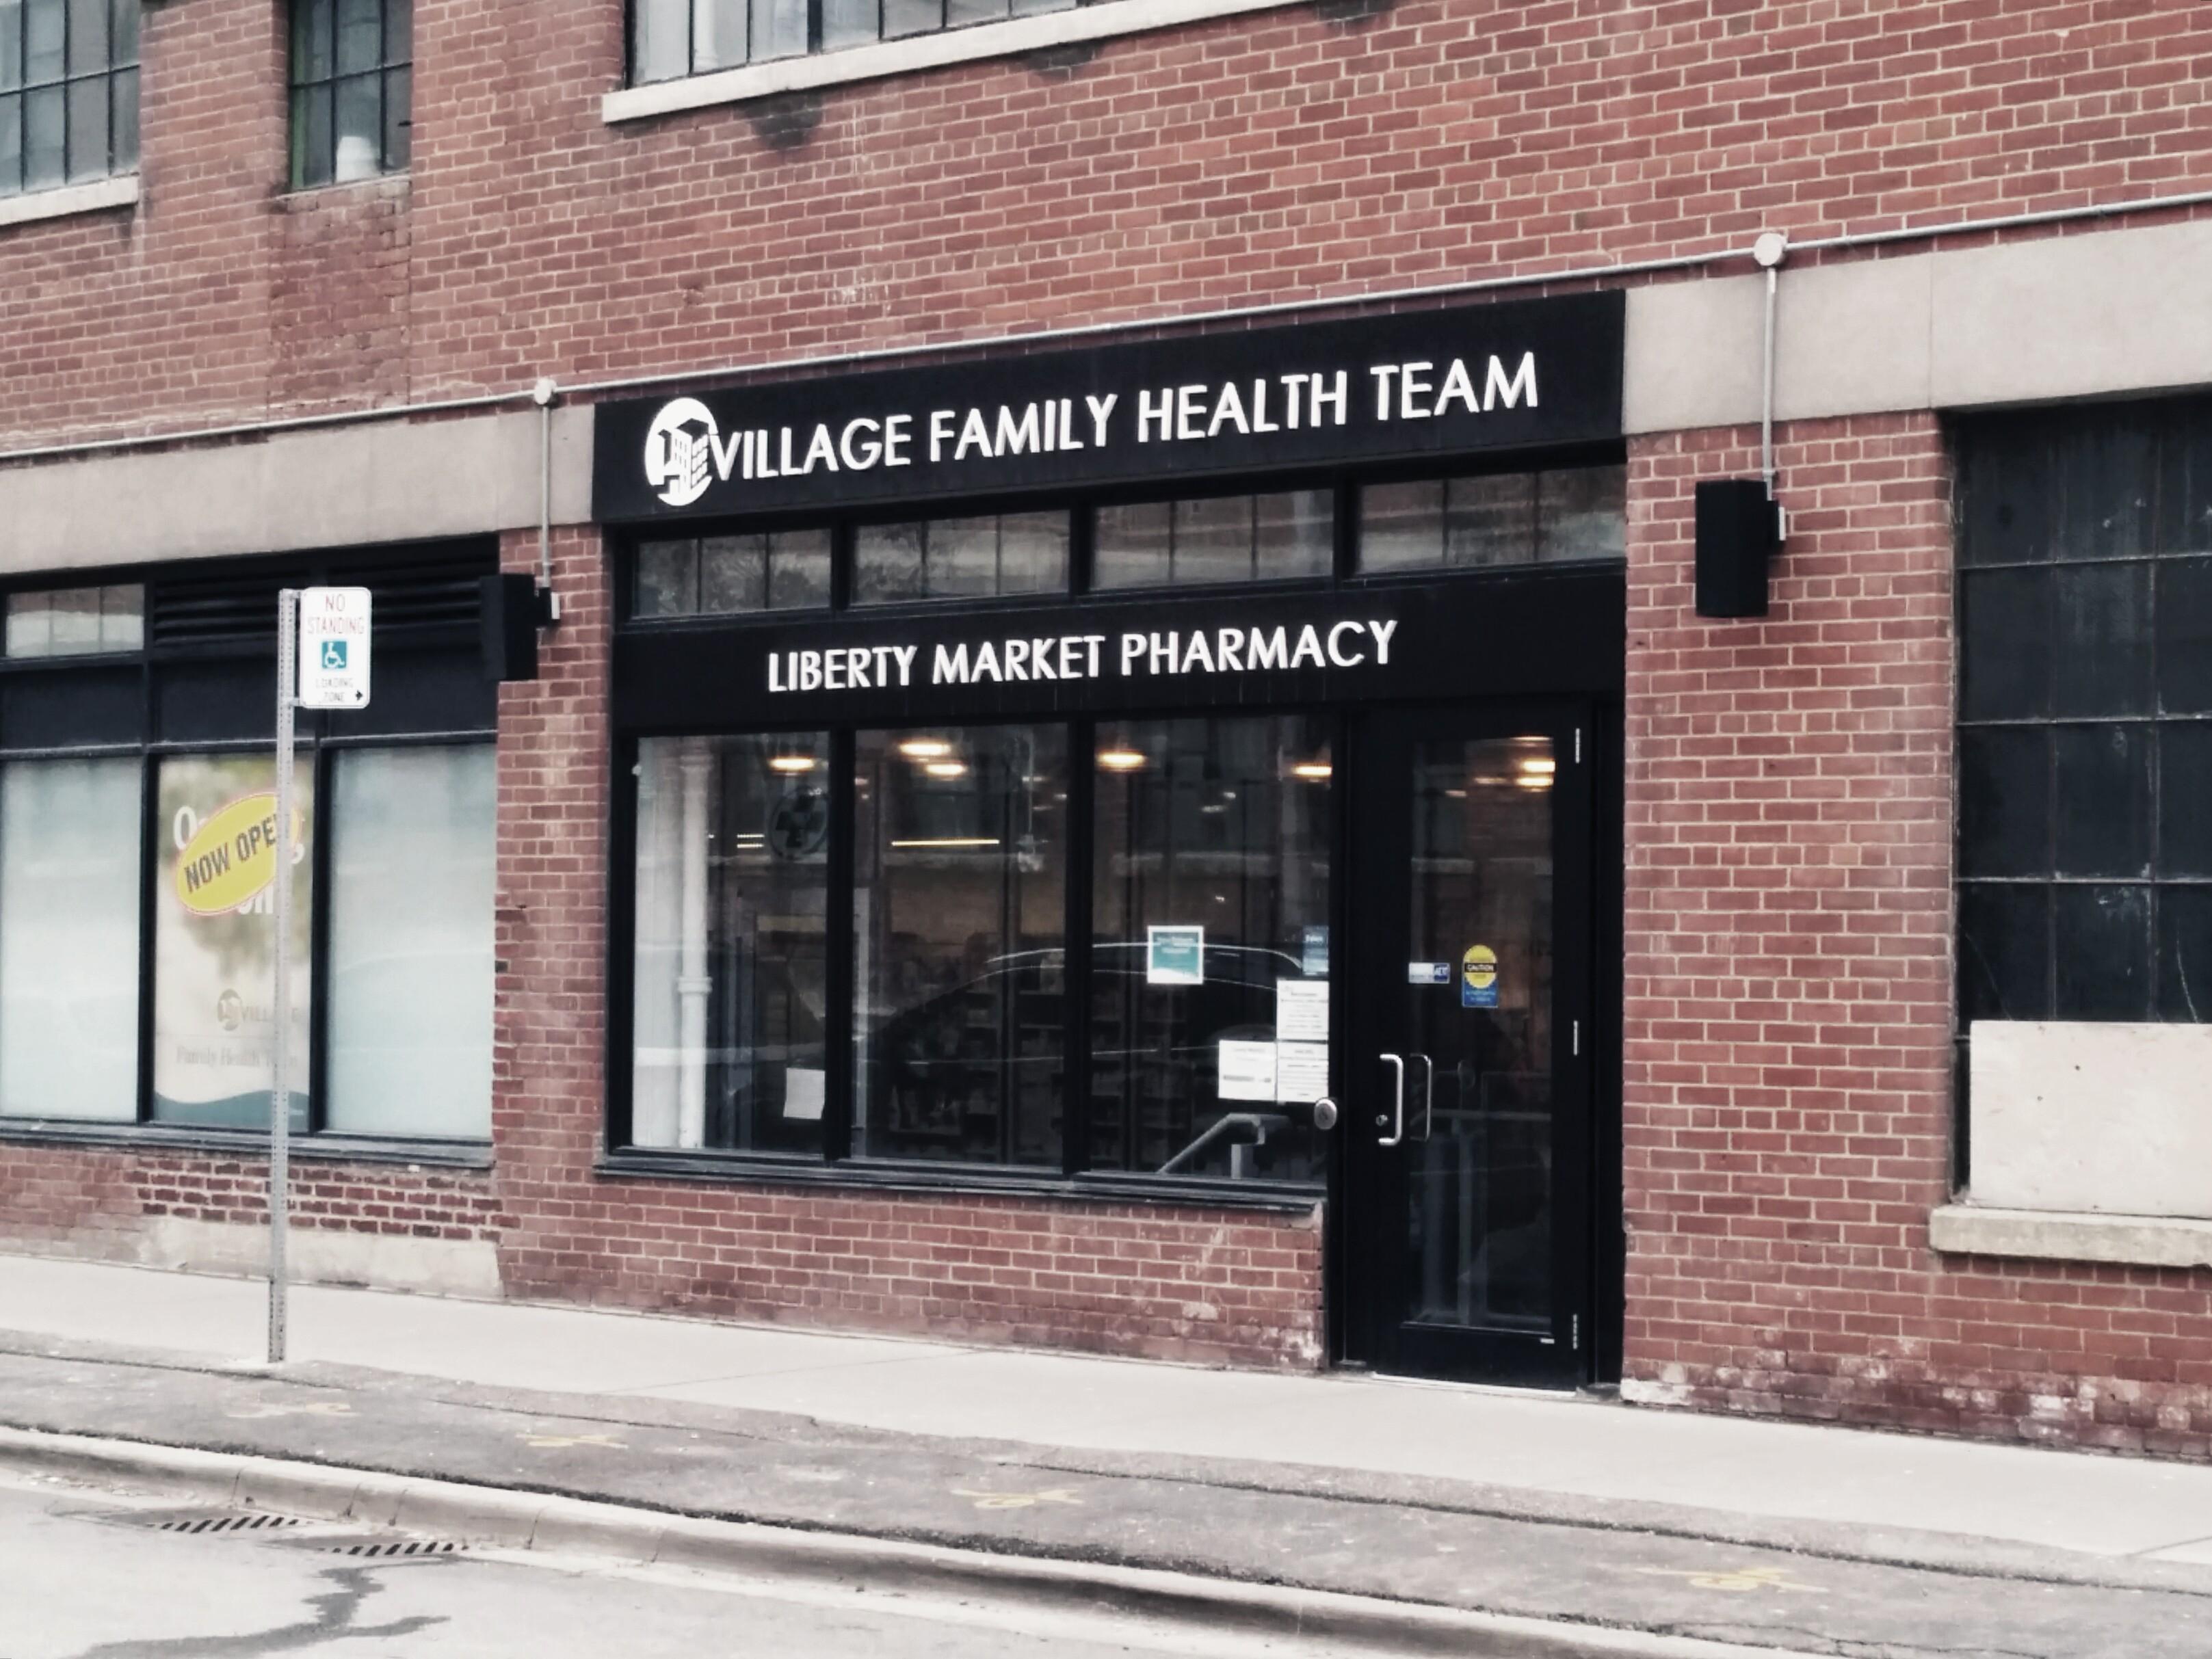 Village Family Health Team